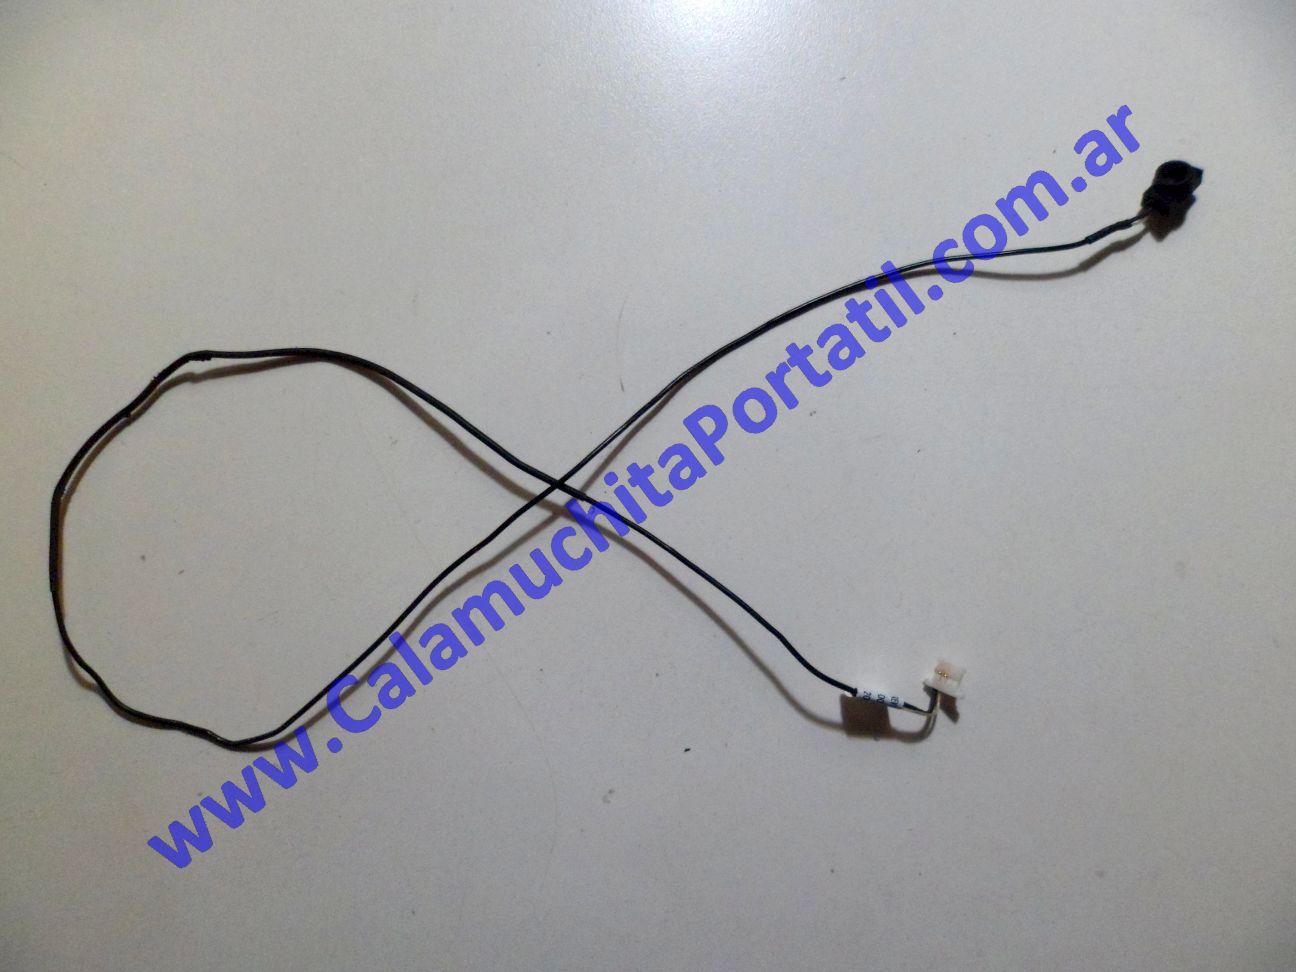 0094EMI Micrófono Compaq Presario CQ40-630la / WD222LA#AC8